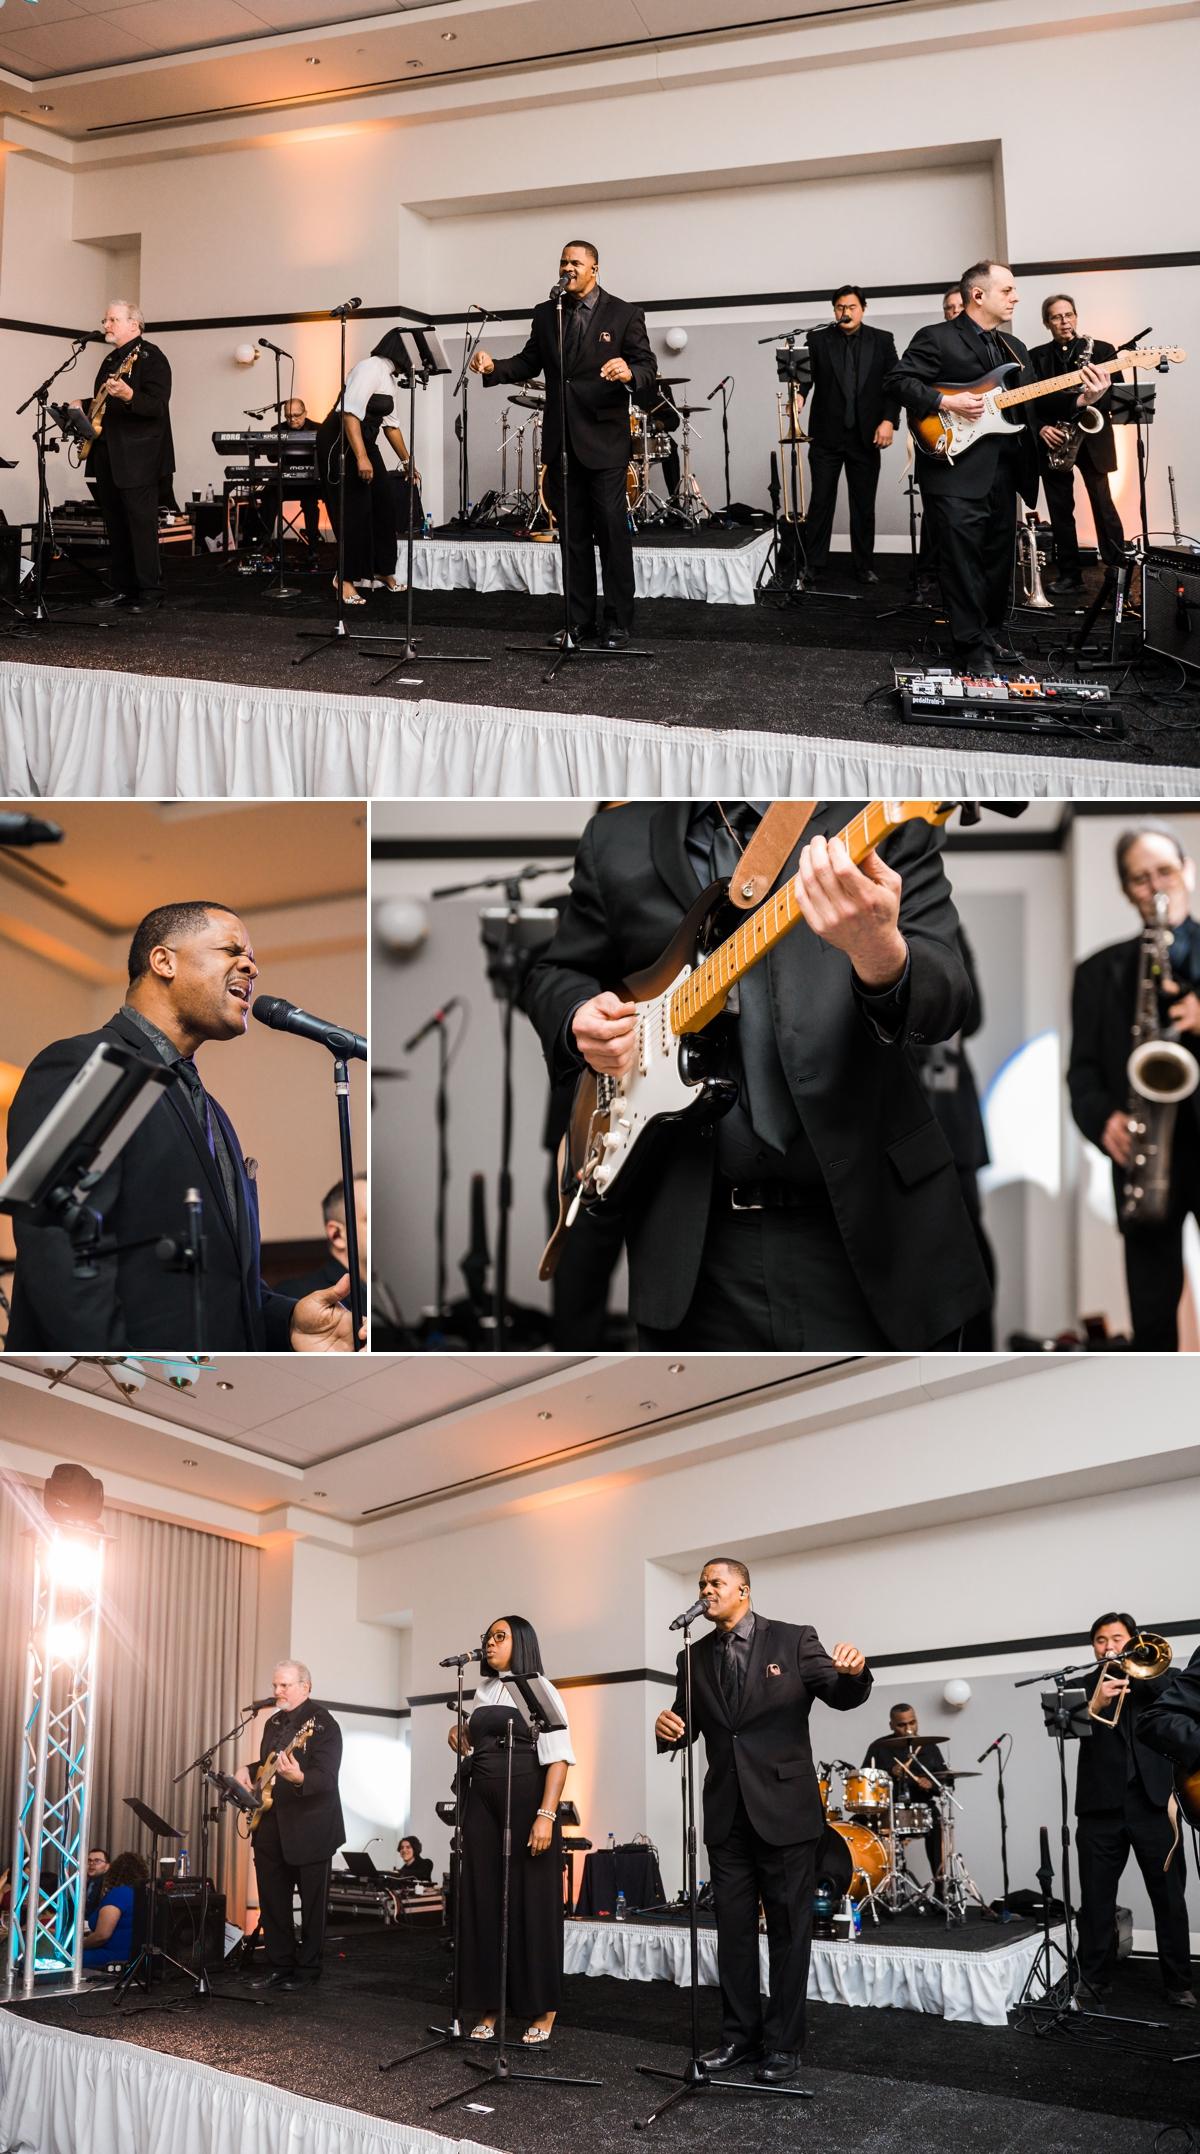 Doppelgänger Band at Houston Hotel Wedding